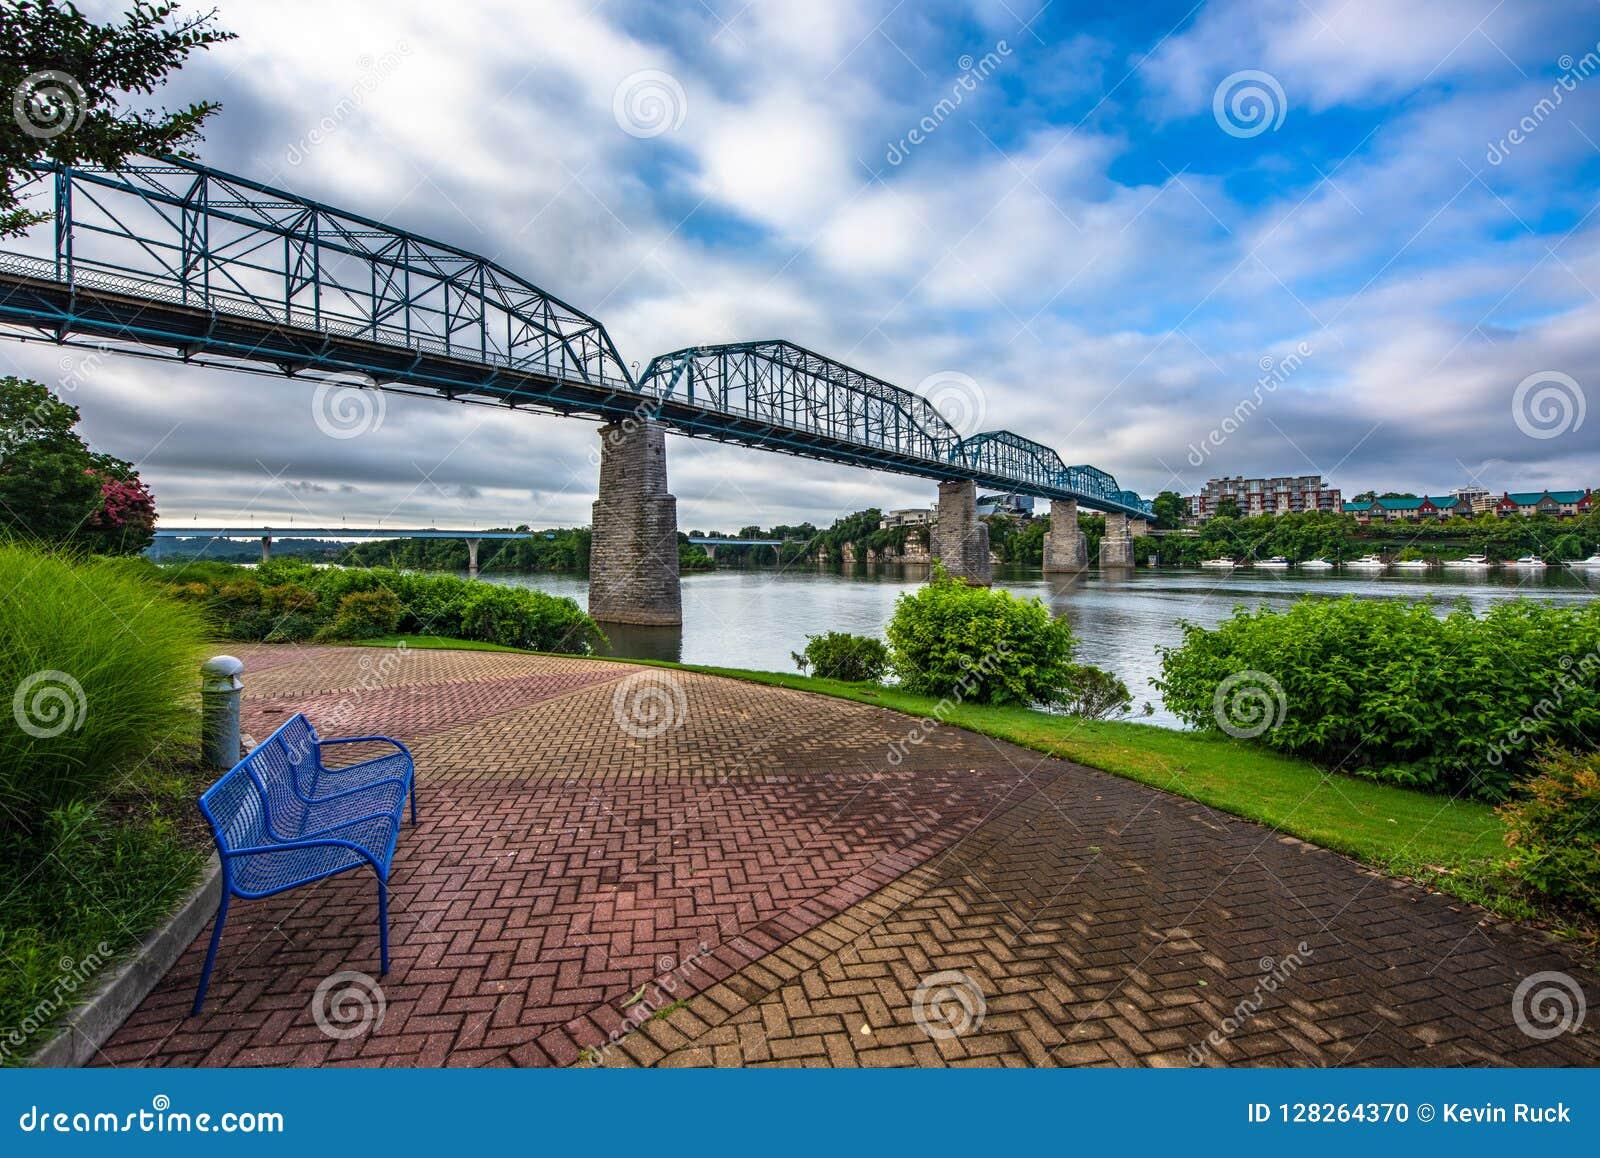 Parque céntrico de Chattanooga Tennessee TN Coolidge